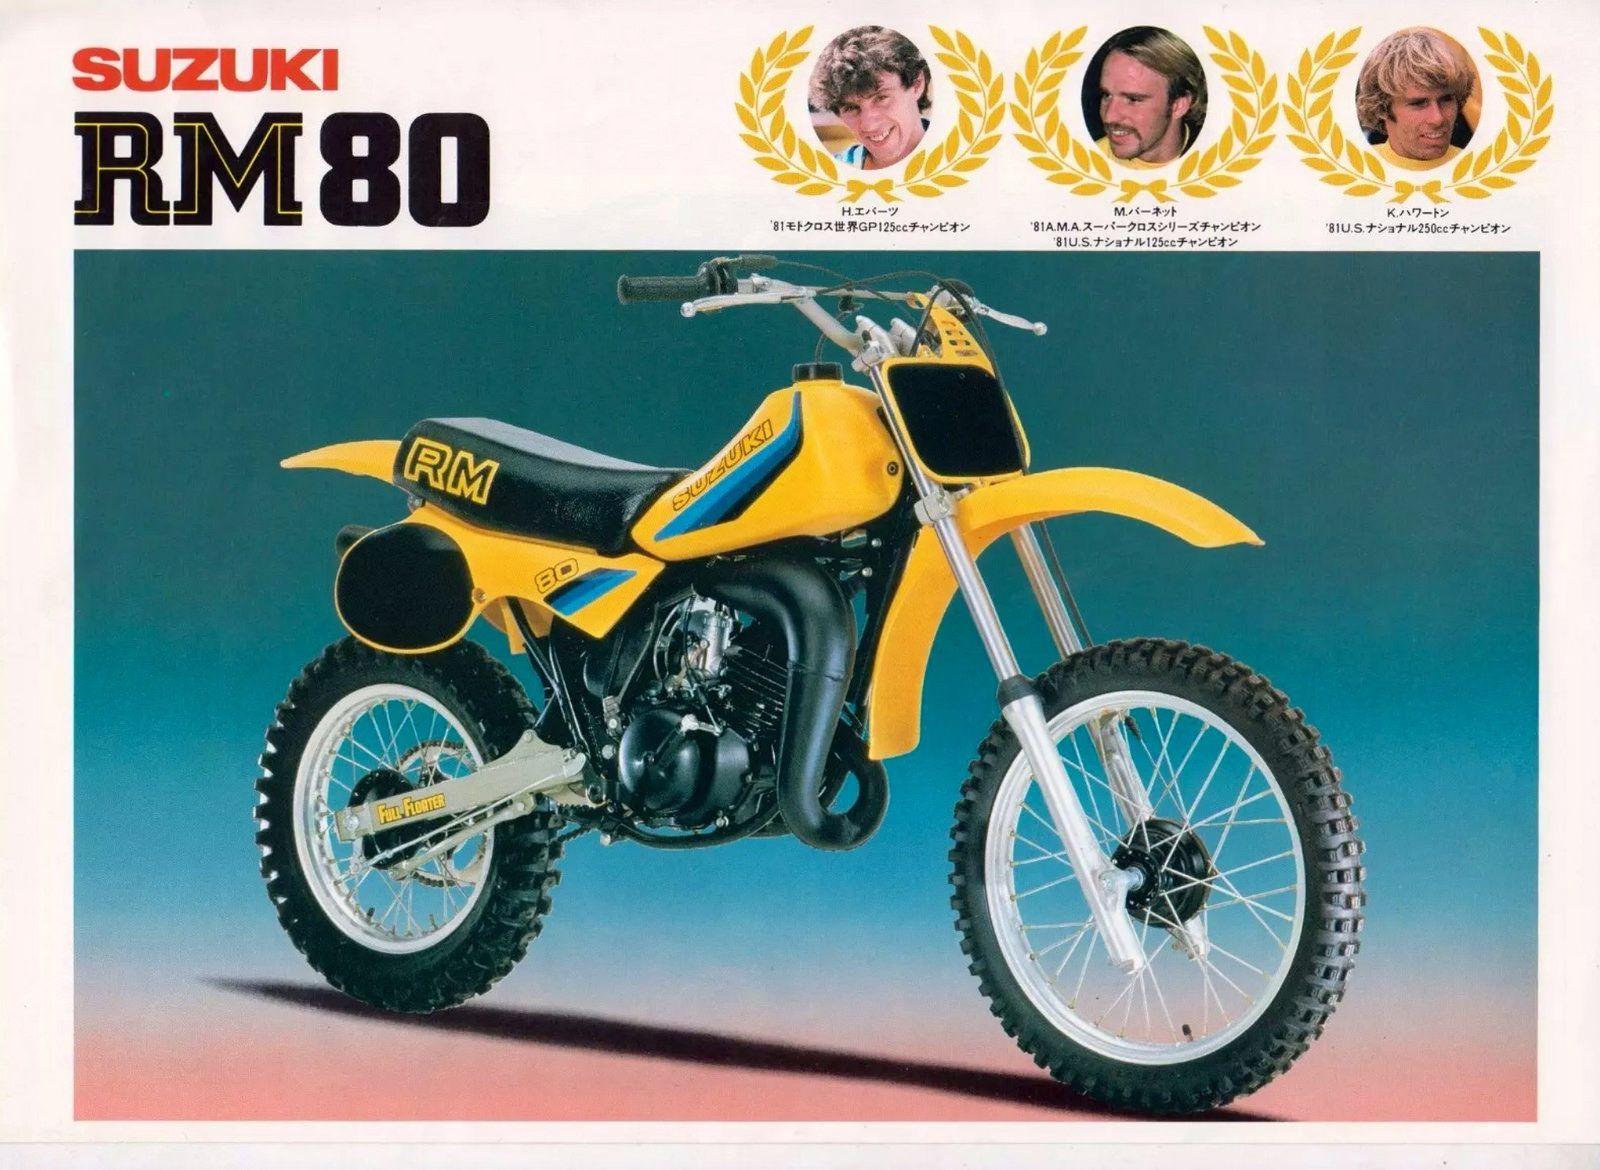 1981 Suzuki Rm80 Brochure Vintage Motocross Motocross Bikes Suzuki